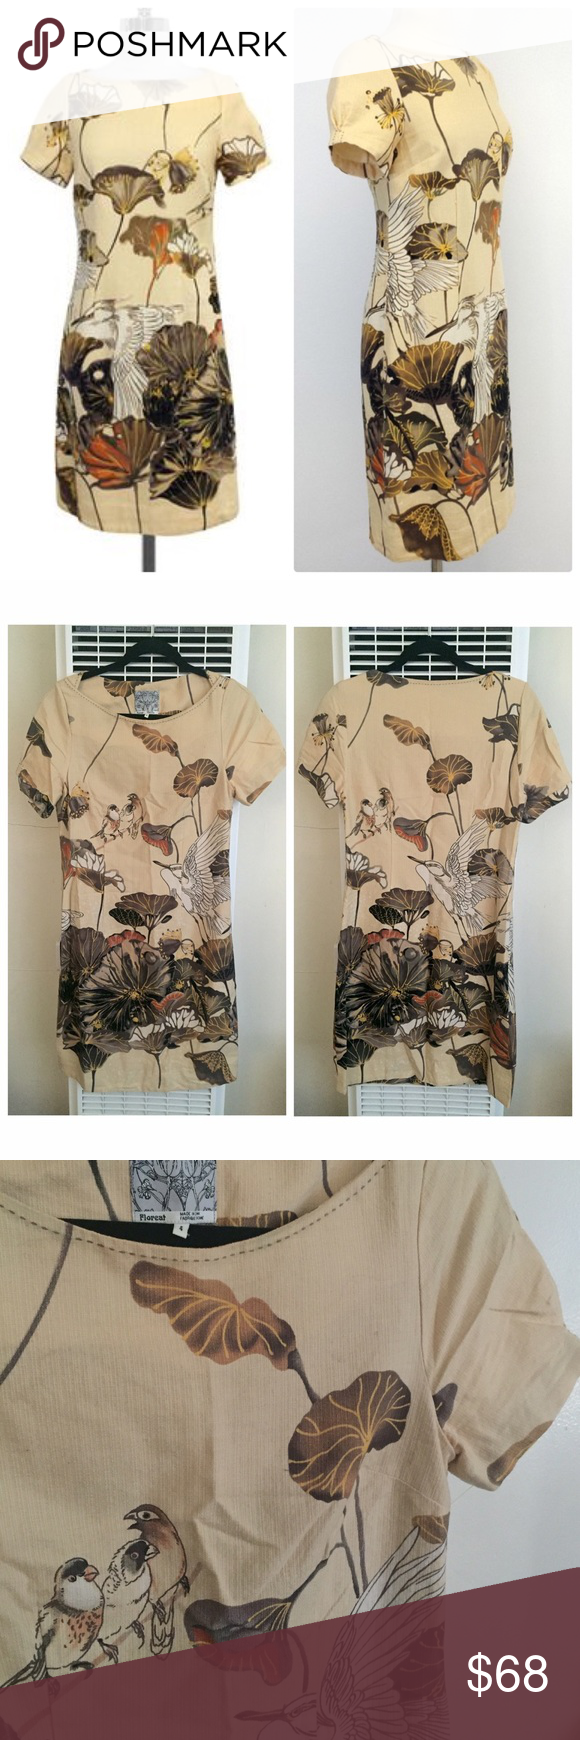 "Anthropologie FLOREAT SNOWY EGRET Shift Dress Product Description Size 4 Beige Floral Bird Print Dress(Missing Sash Belt) Body 100% Cotton Lining 100% Acetate Concealed side zip Short sleeves Measurements (Approx): Bust 34"" Waist 28"" Total length 36"" Anthropologie Dresses"